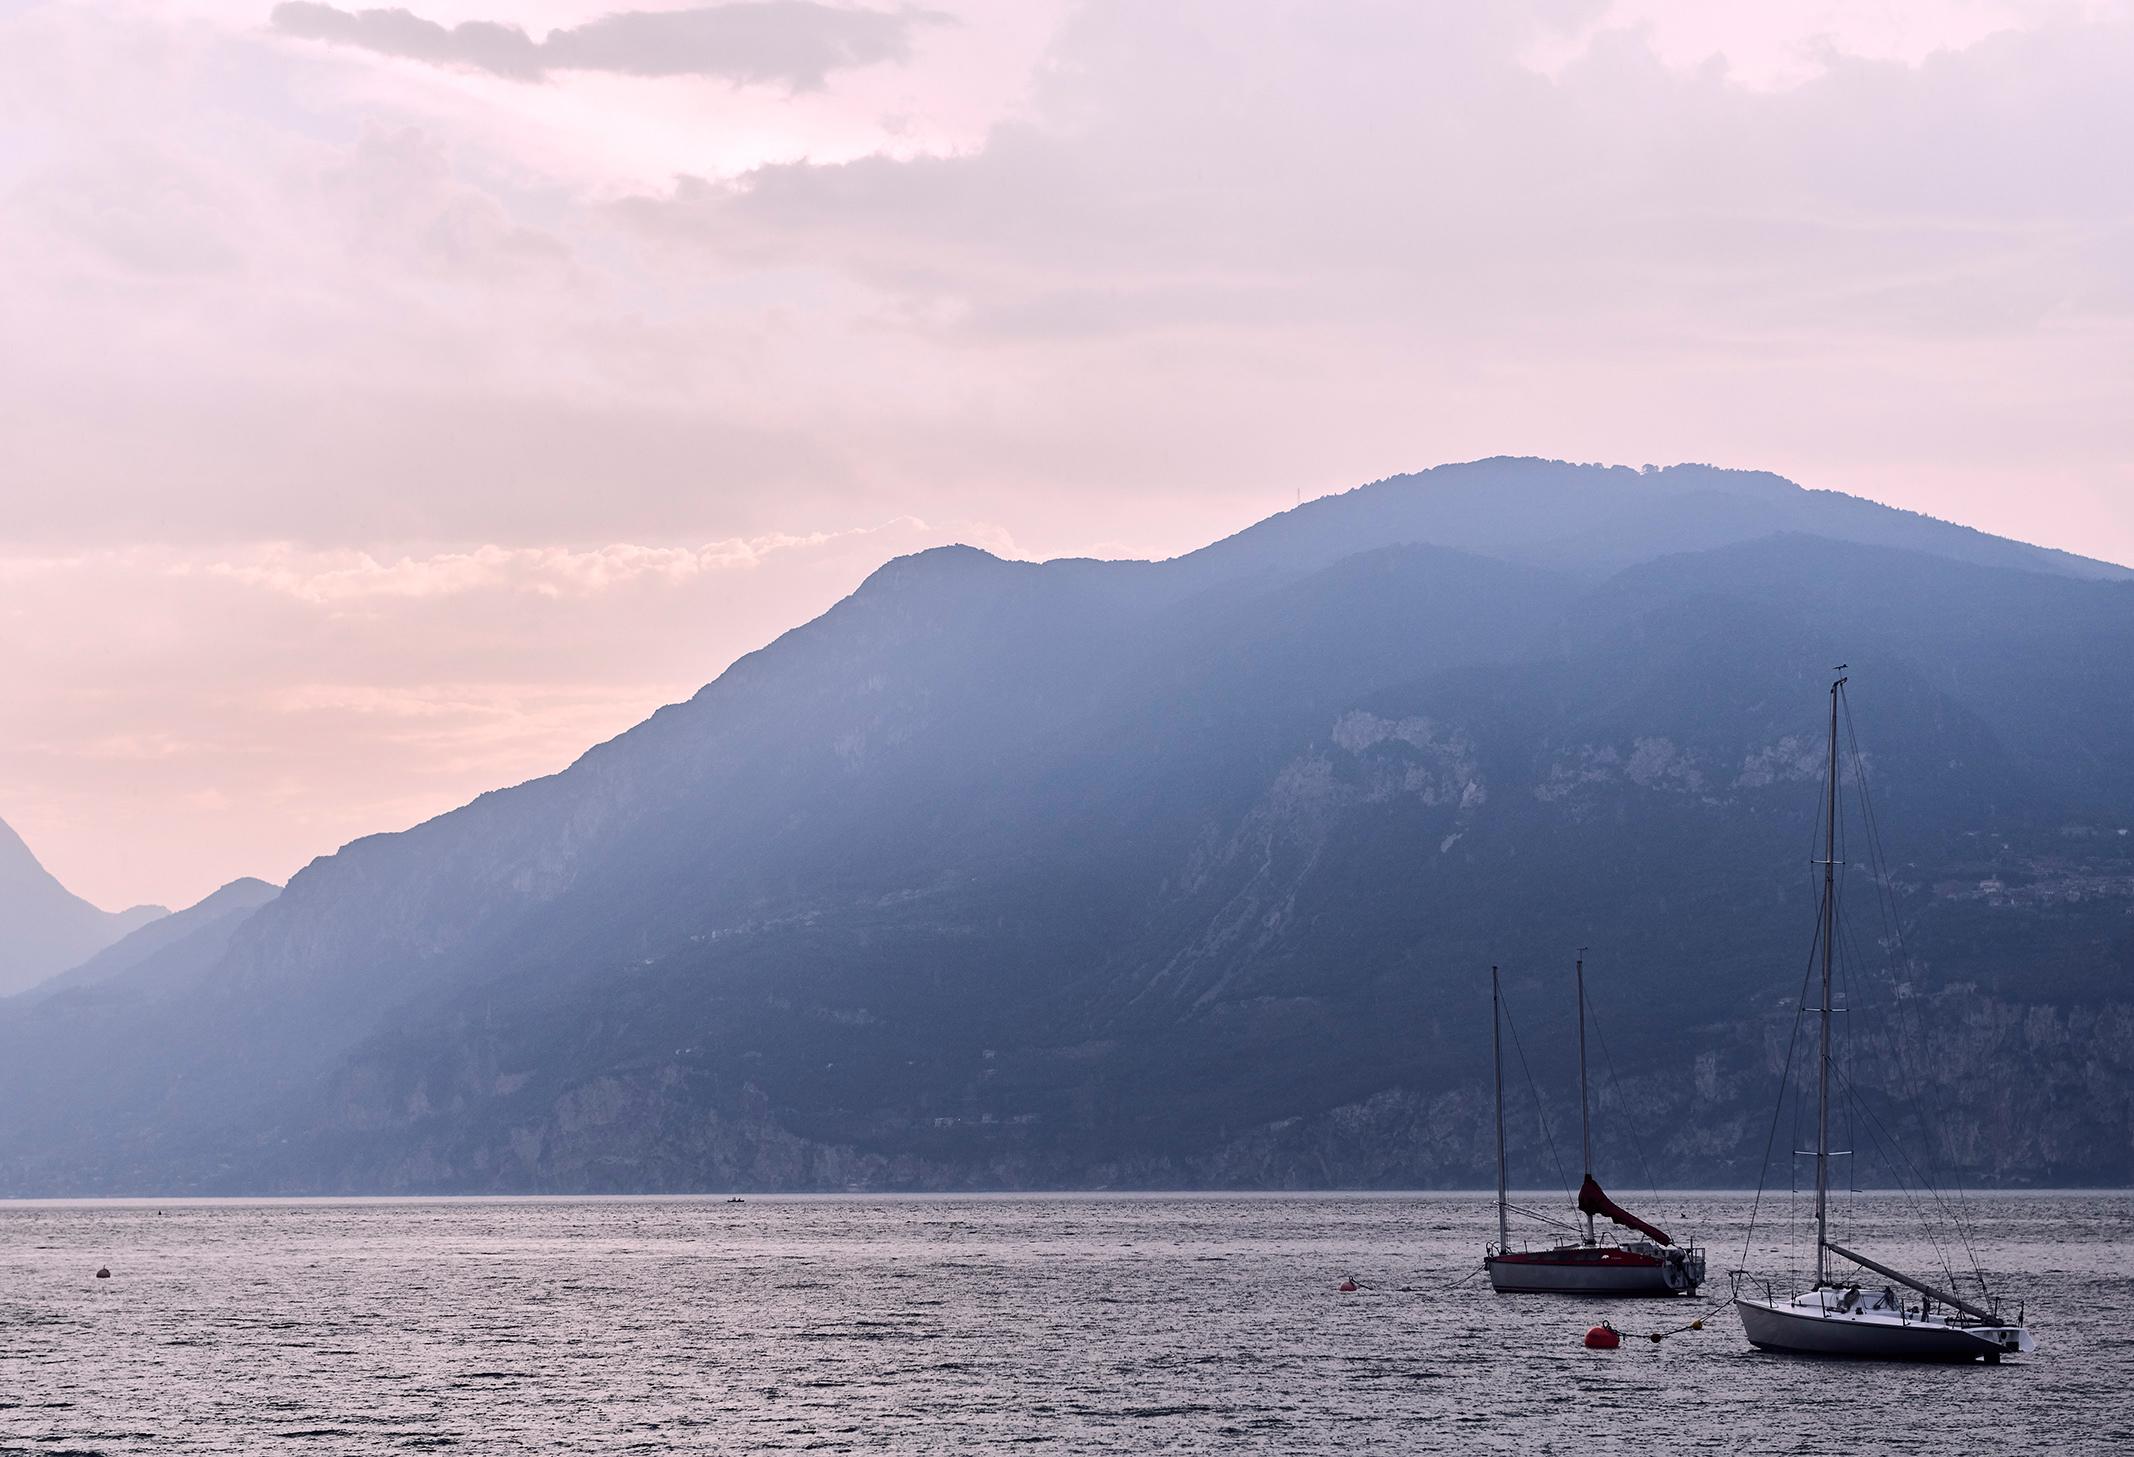 Boats at sunset on Lake Garda, Italy. Kirsty Owen photography